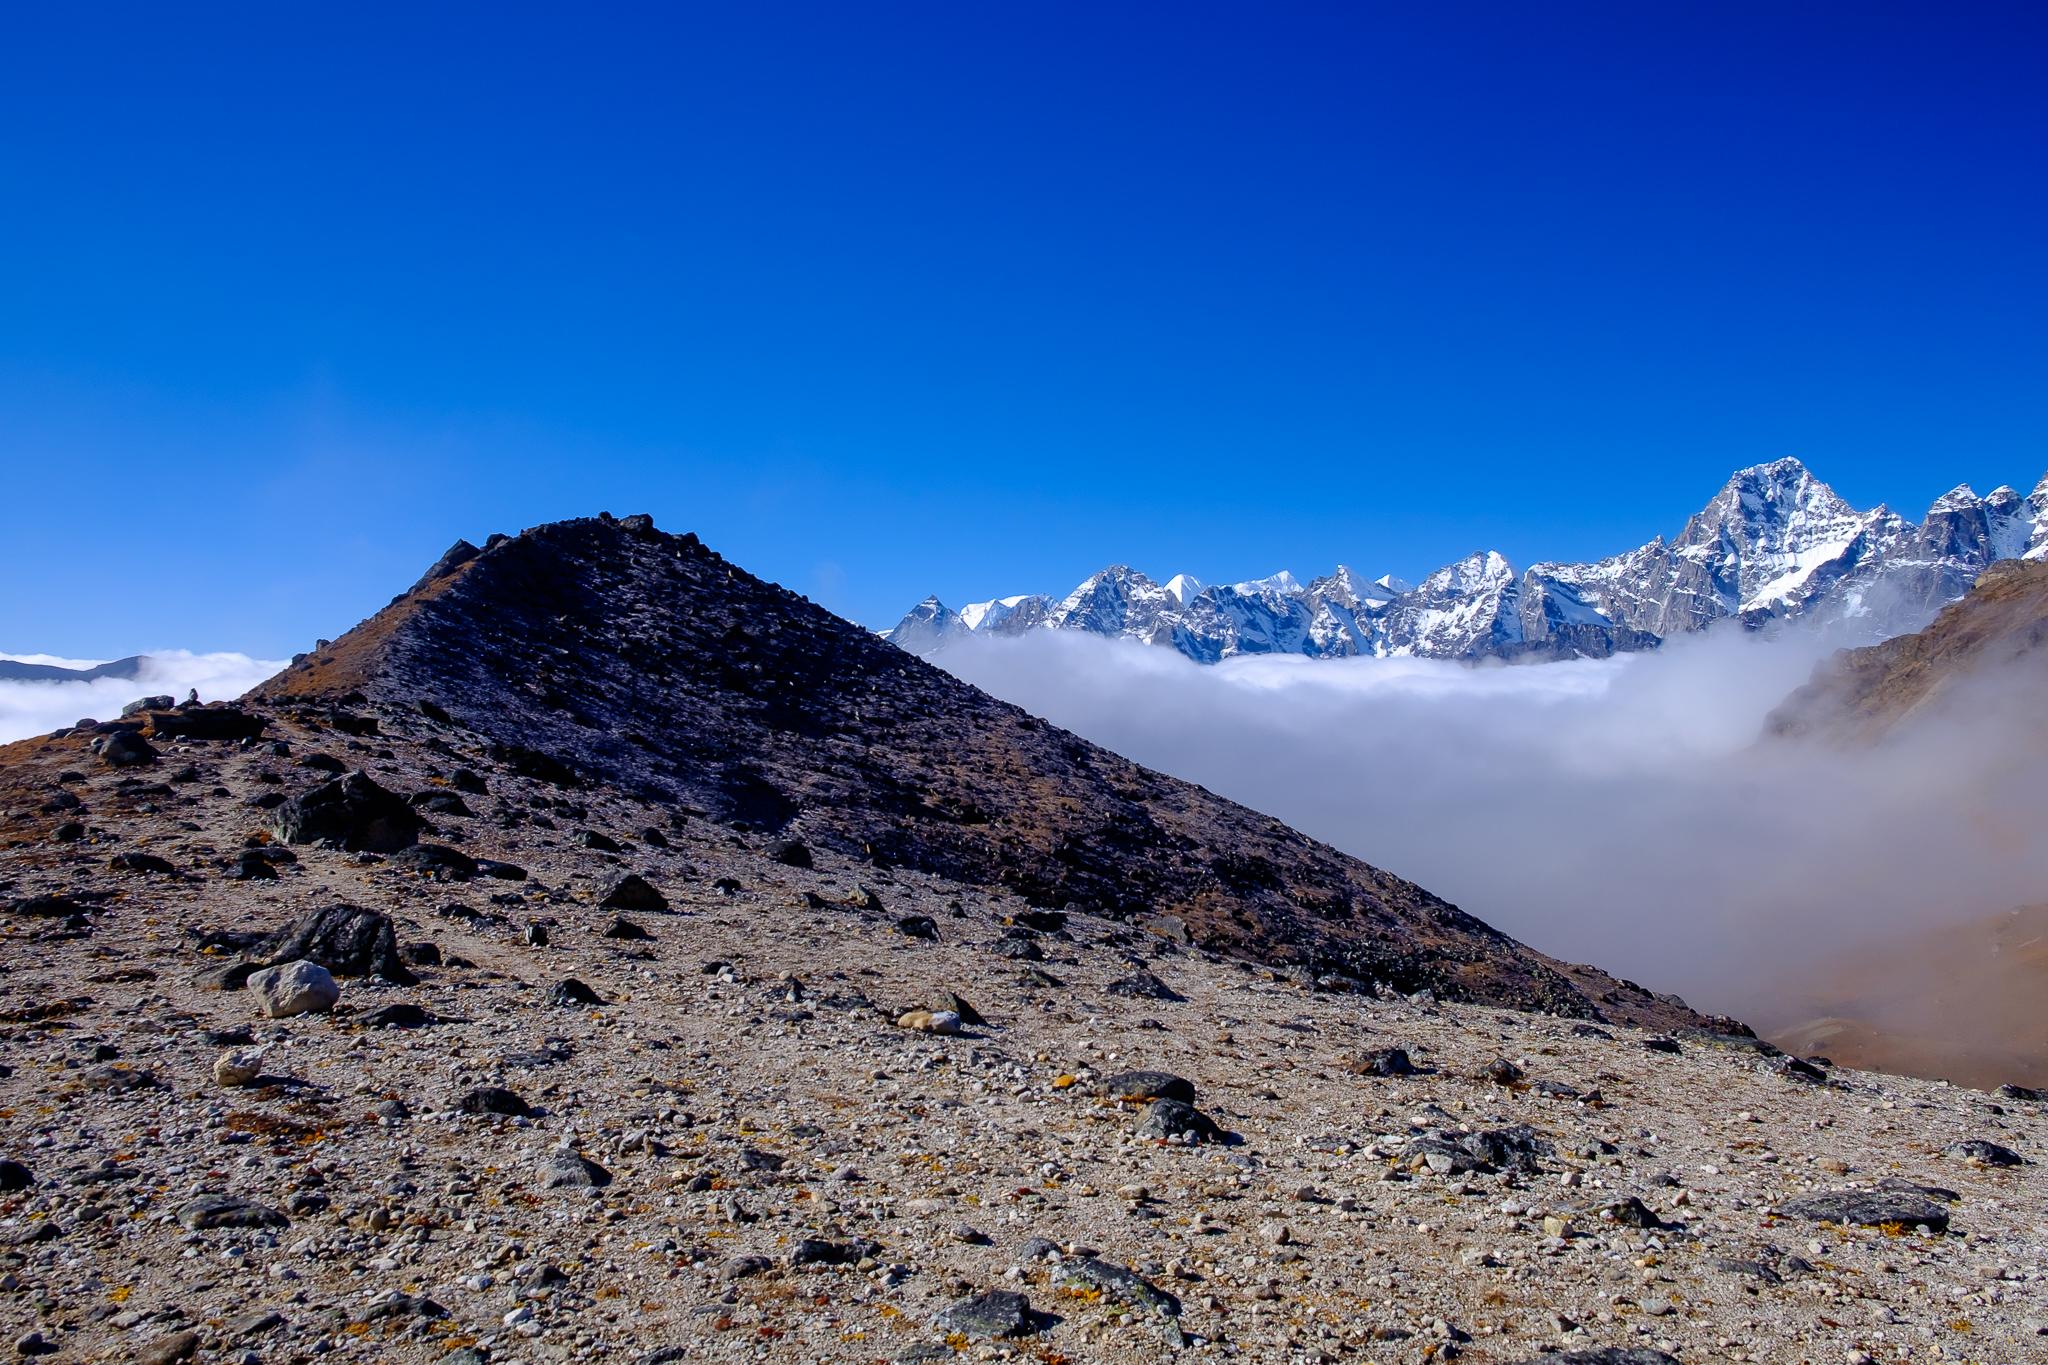 EverestTrekPart4_017a.jpg